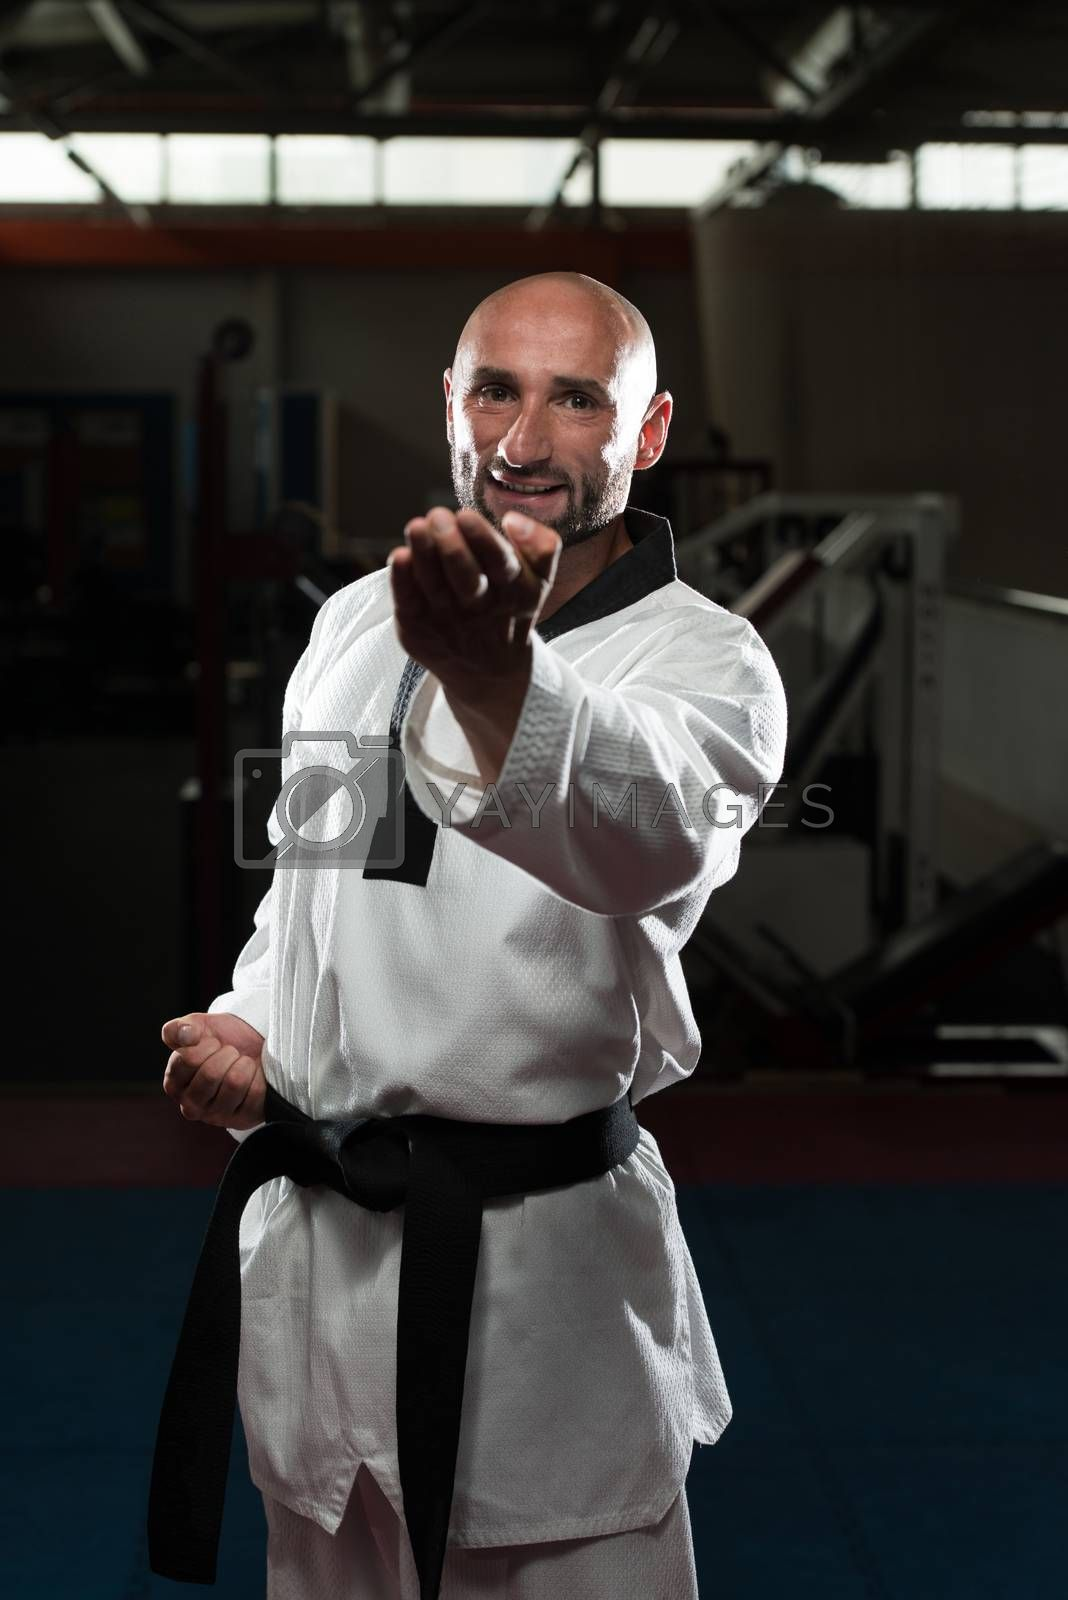 Mature Men Practicing His Karate Moves